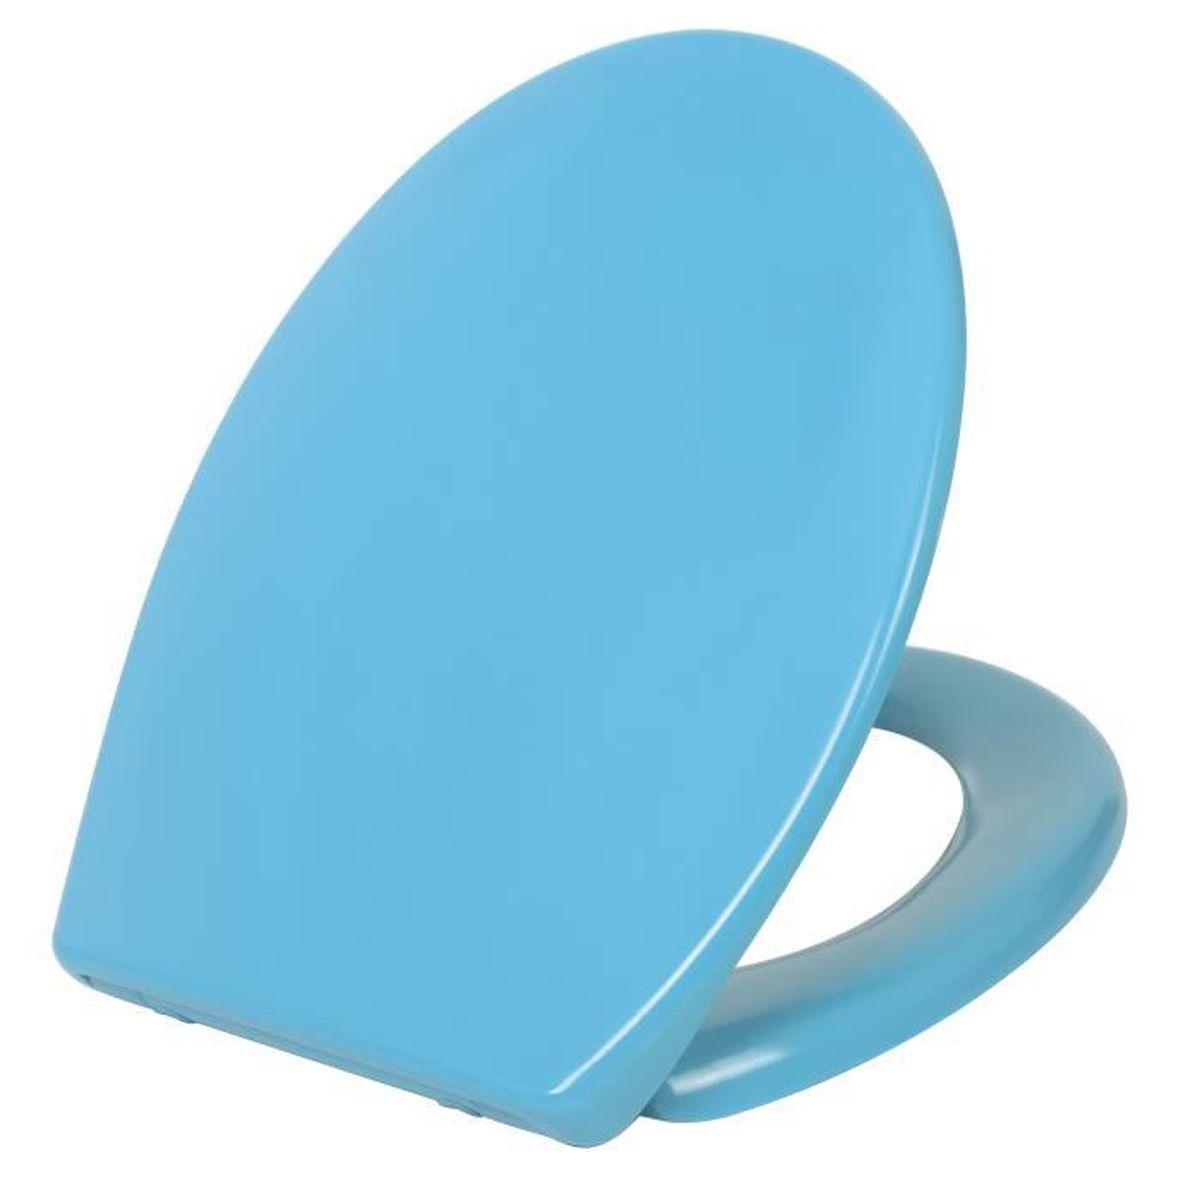 Abattant Wc Slowclip Bleu Canard Inventiv Achat Vente Abattant Wc Abattant Wc Slowclip Bleu Canard Inventiv Cdiscount